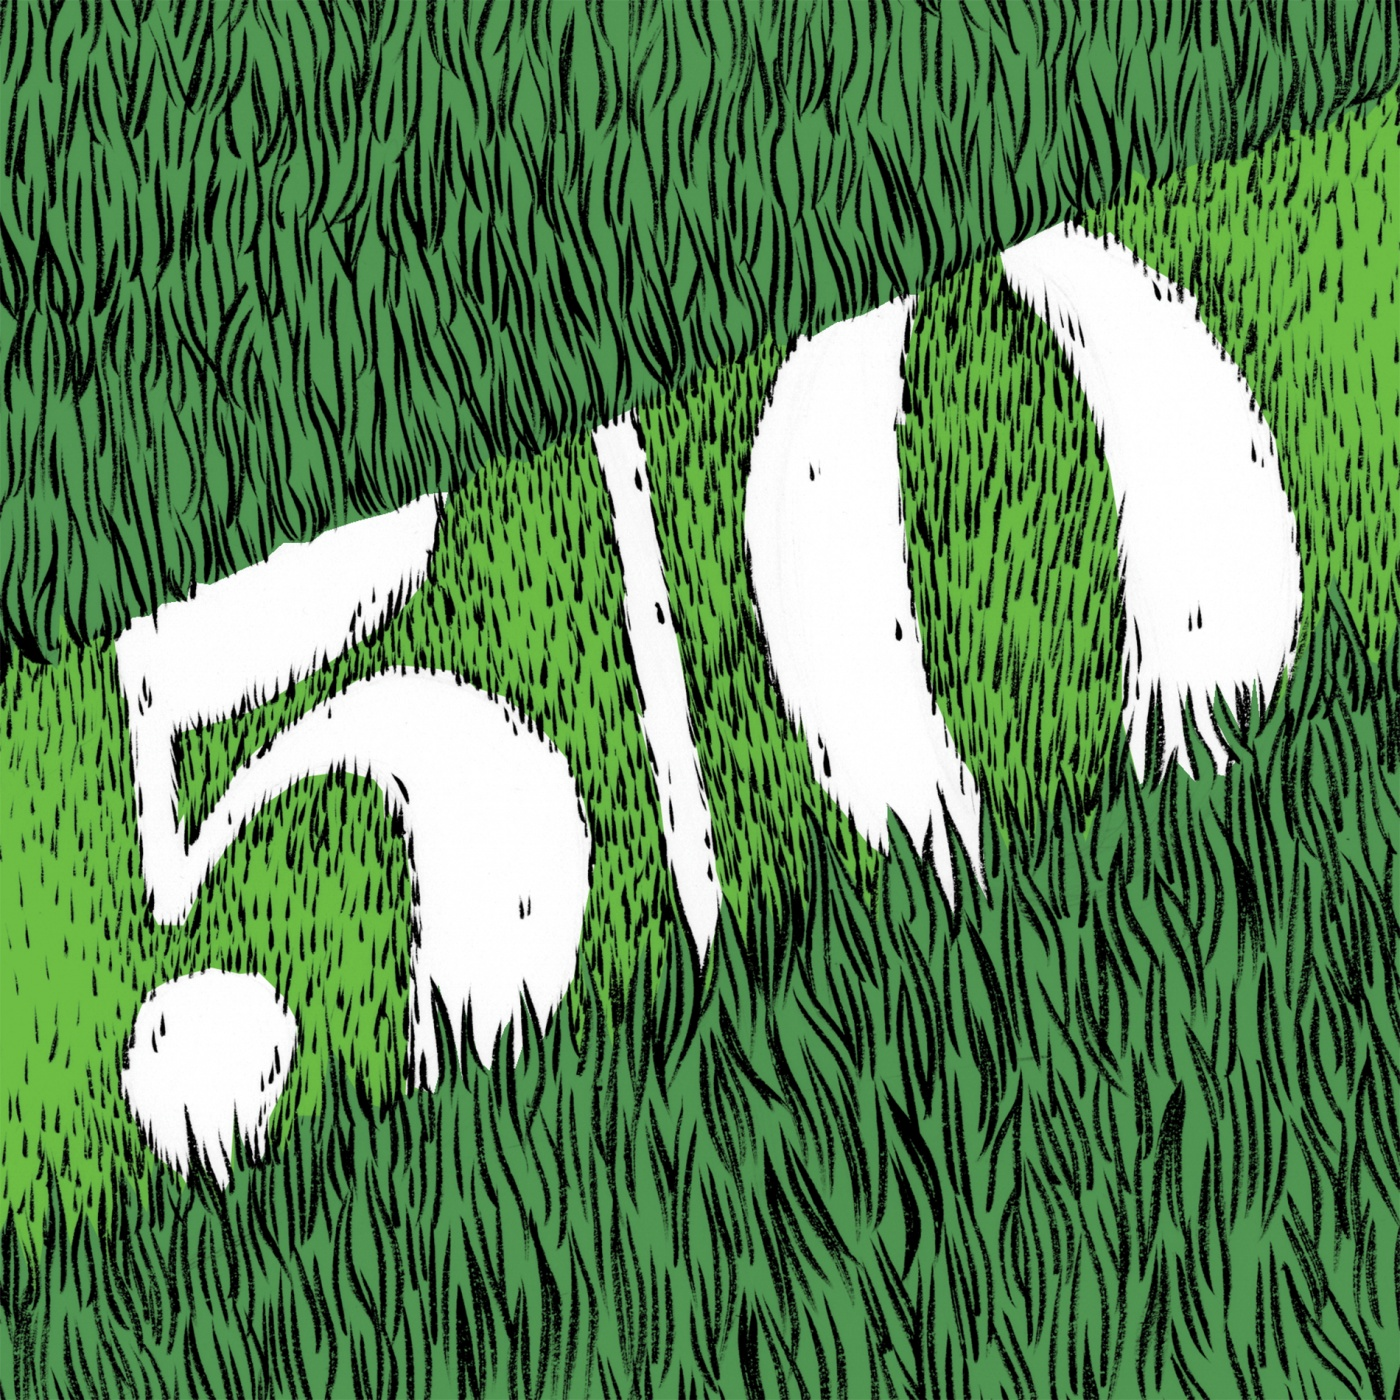 Illustration of 50 yard line by Kelsey Dake